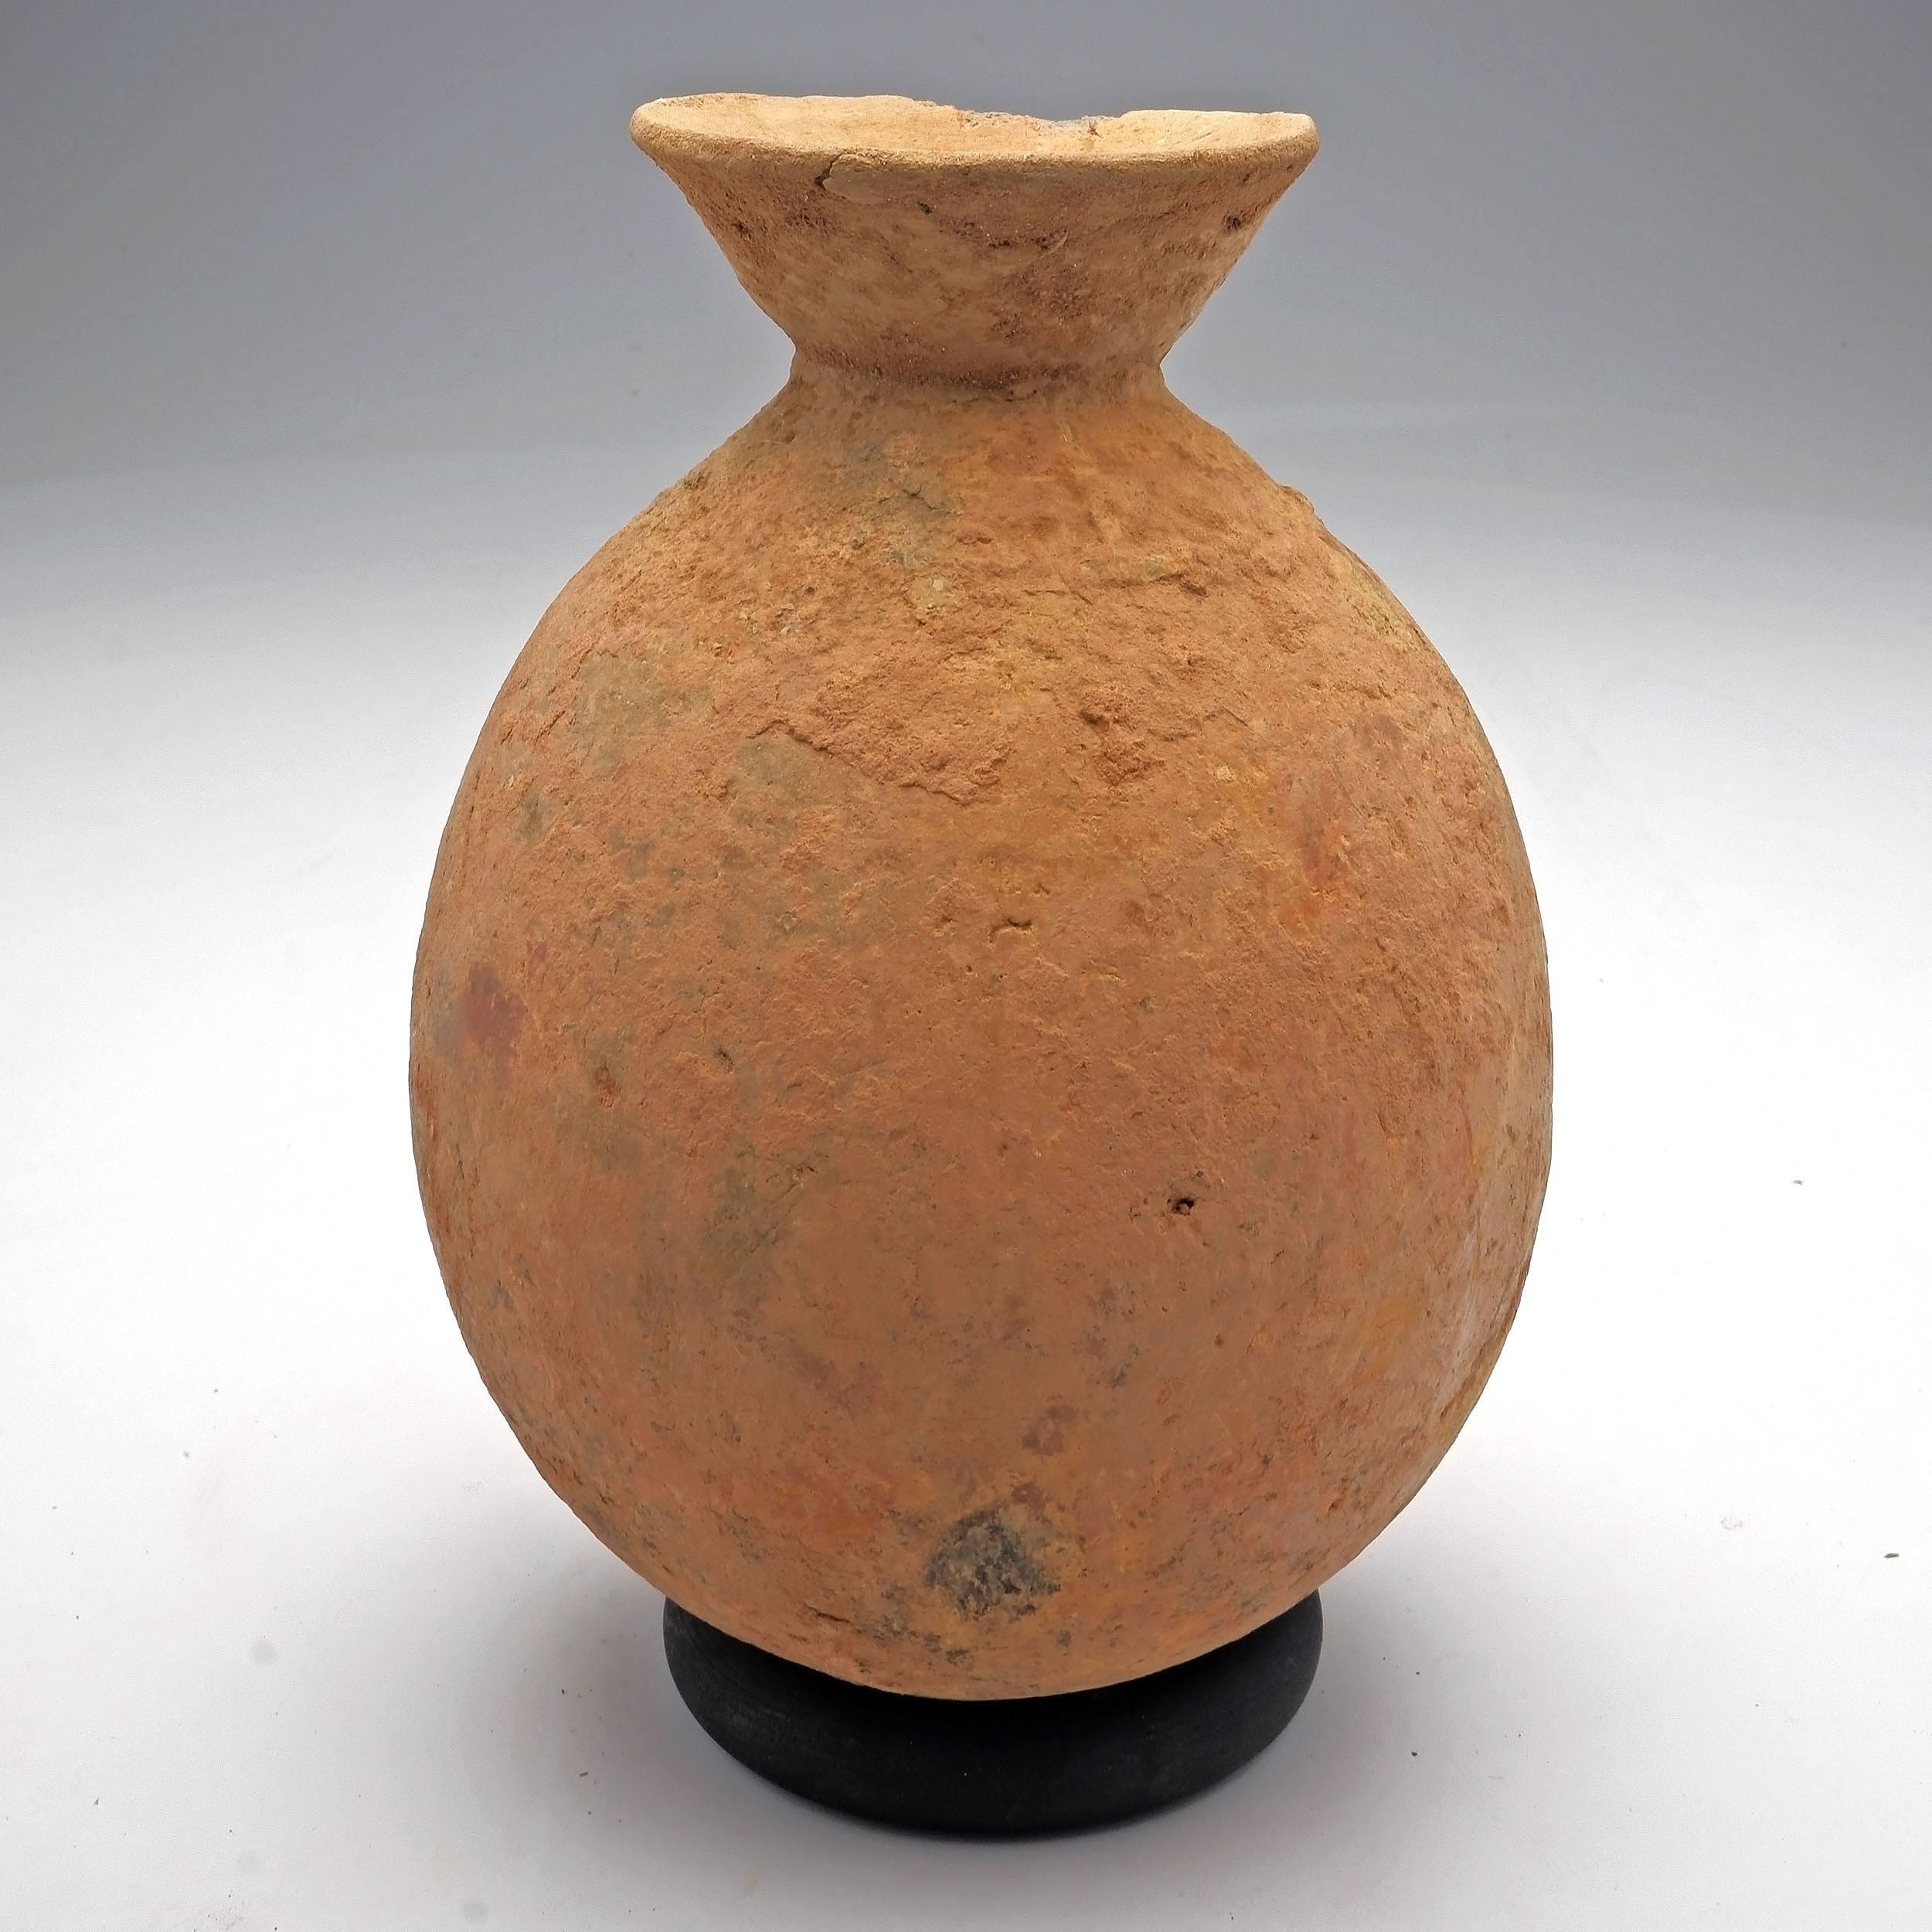 'Ceramic Pot, Fulani/Tuareg Tribe, Goundam Region Mali'